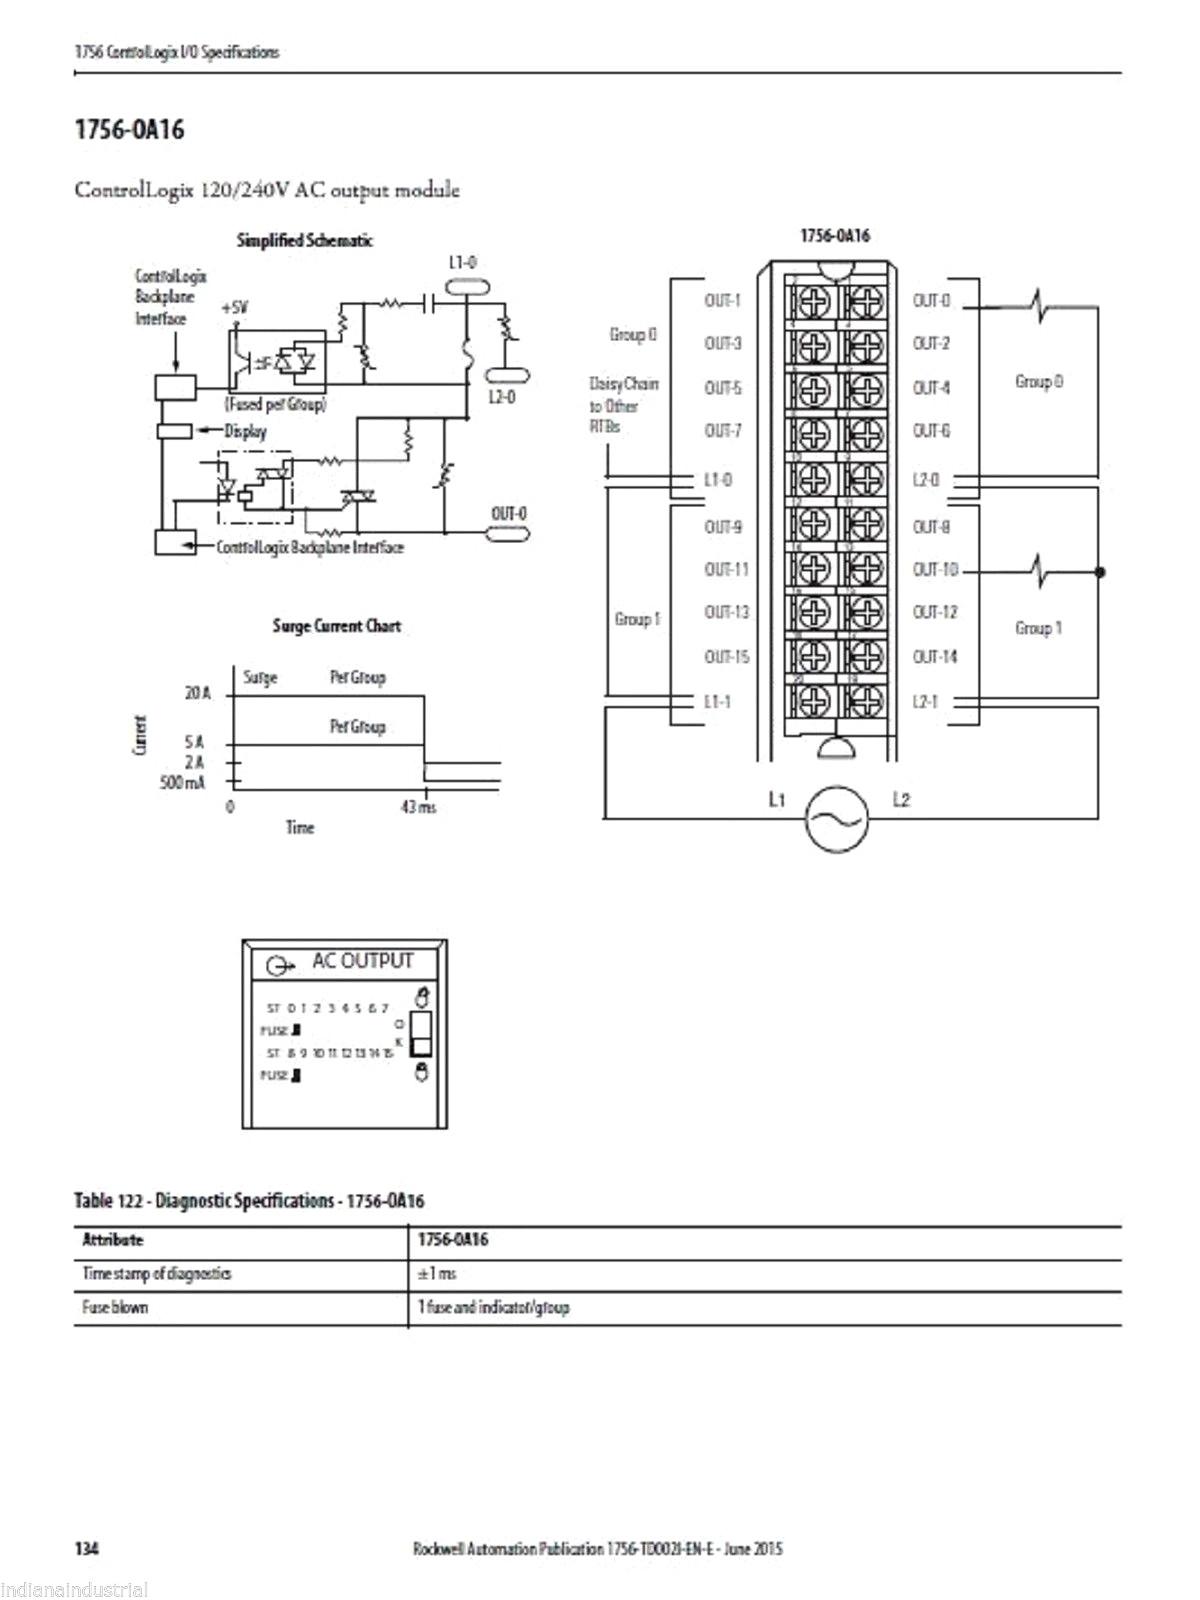 allen bradley 1794 ib16 wiring diagram | free wiring diagram wiring diagram free download afv10a